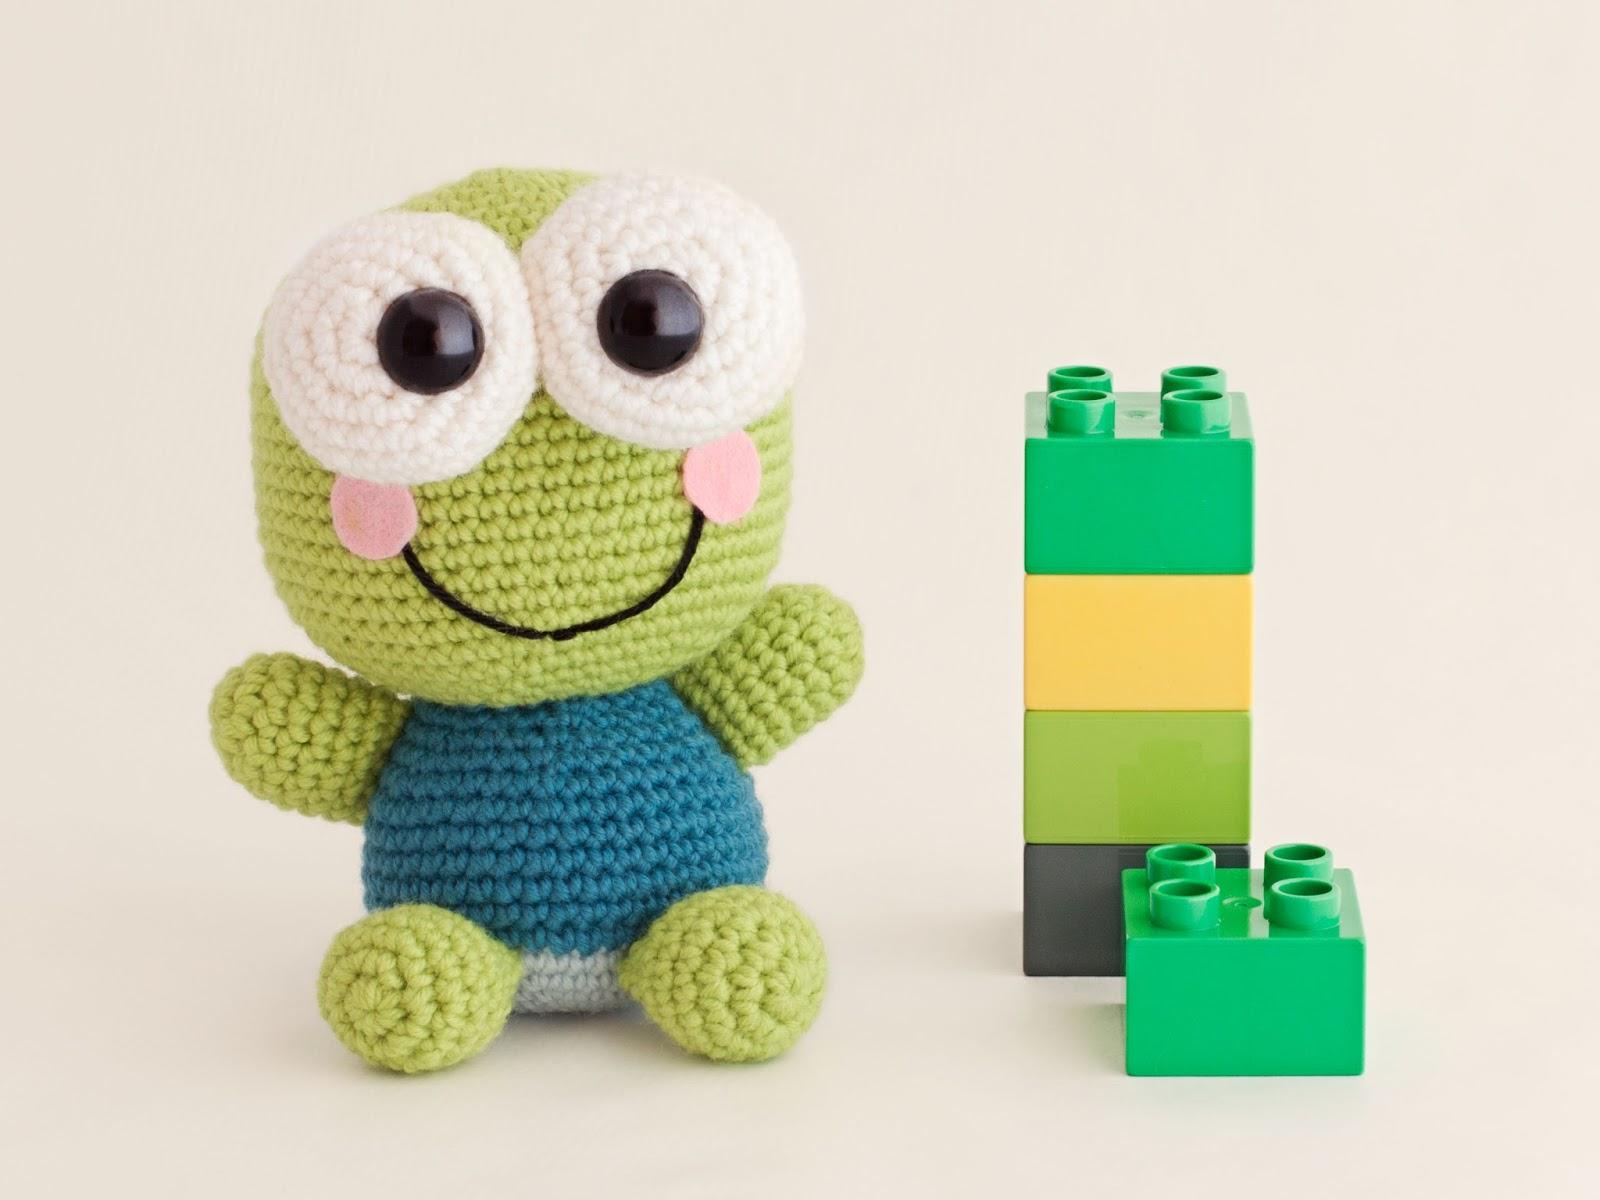 amigurumi-rana-keroppi-patron-frog-pattern